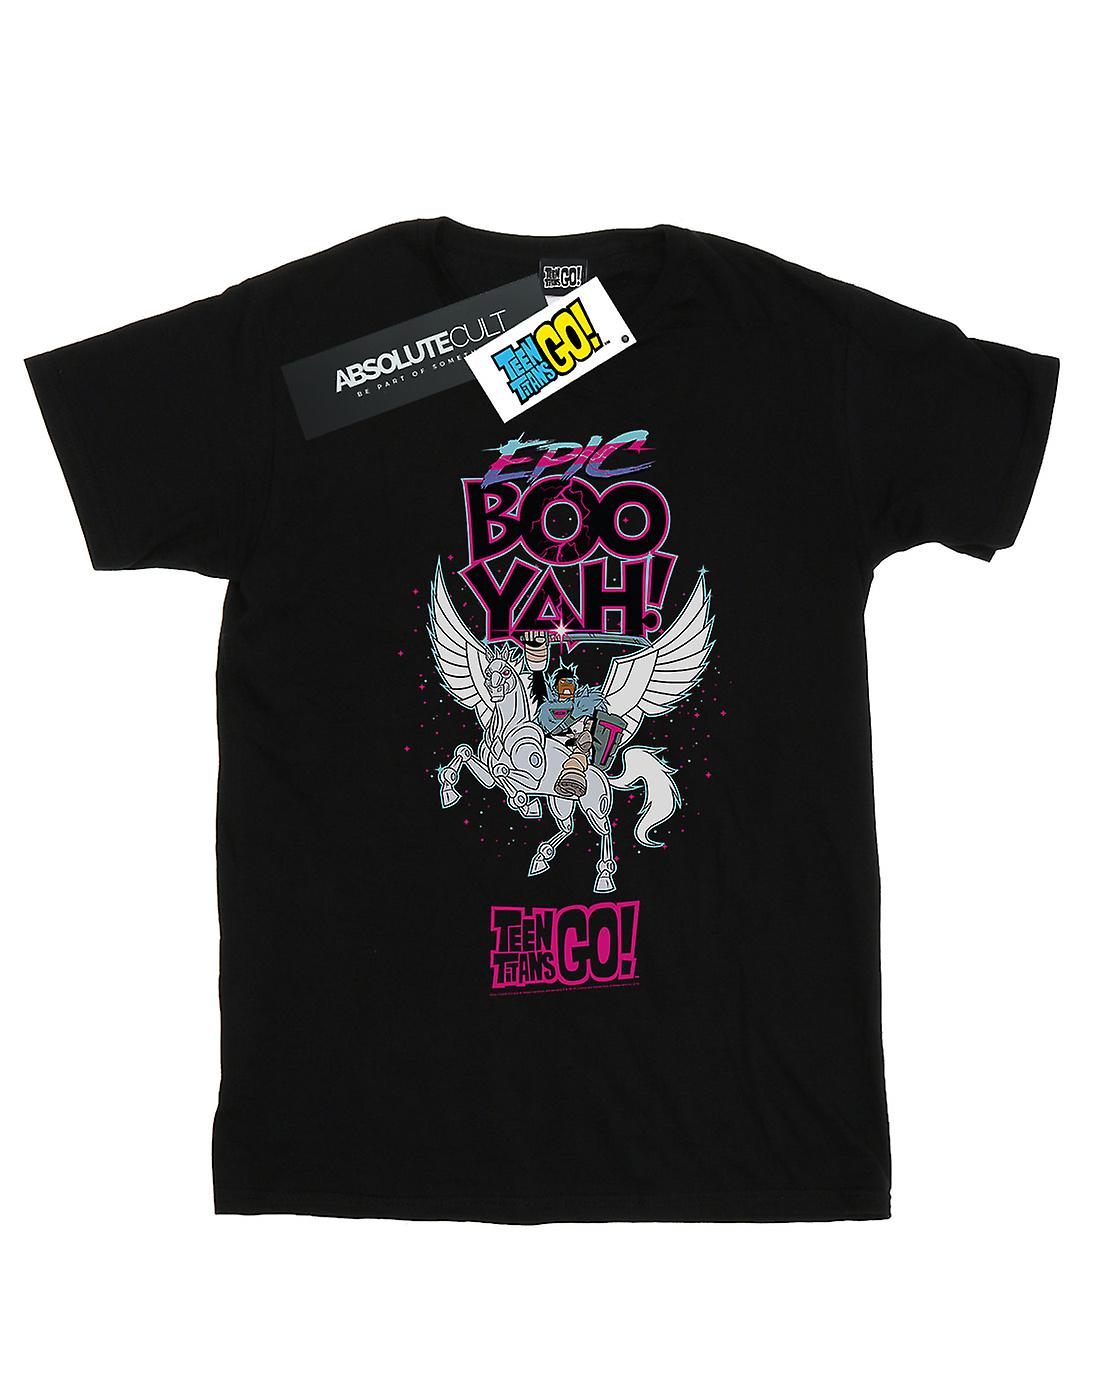 DC Comics Girls Teen Titans Go Epic Boo Yah T-Shirt